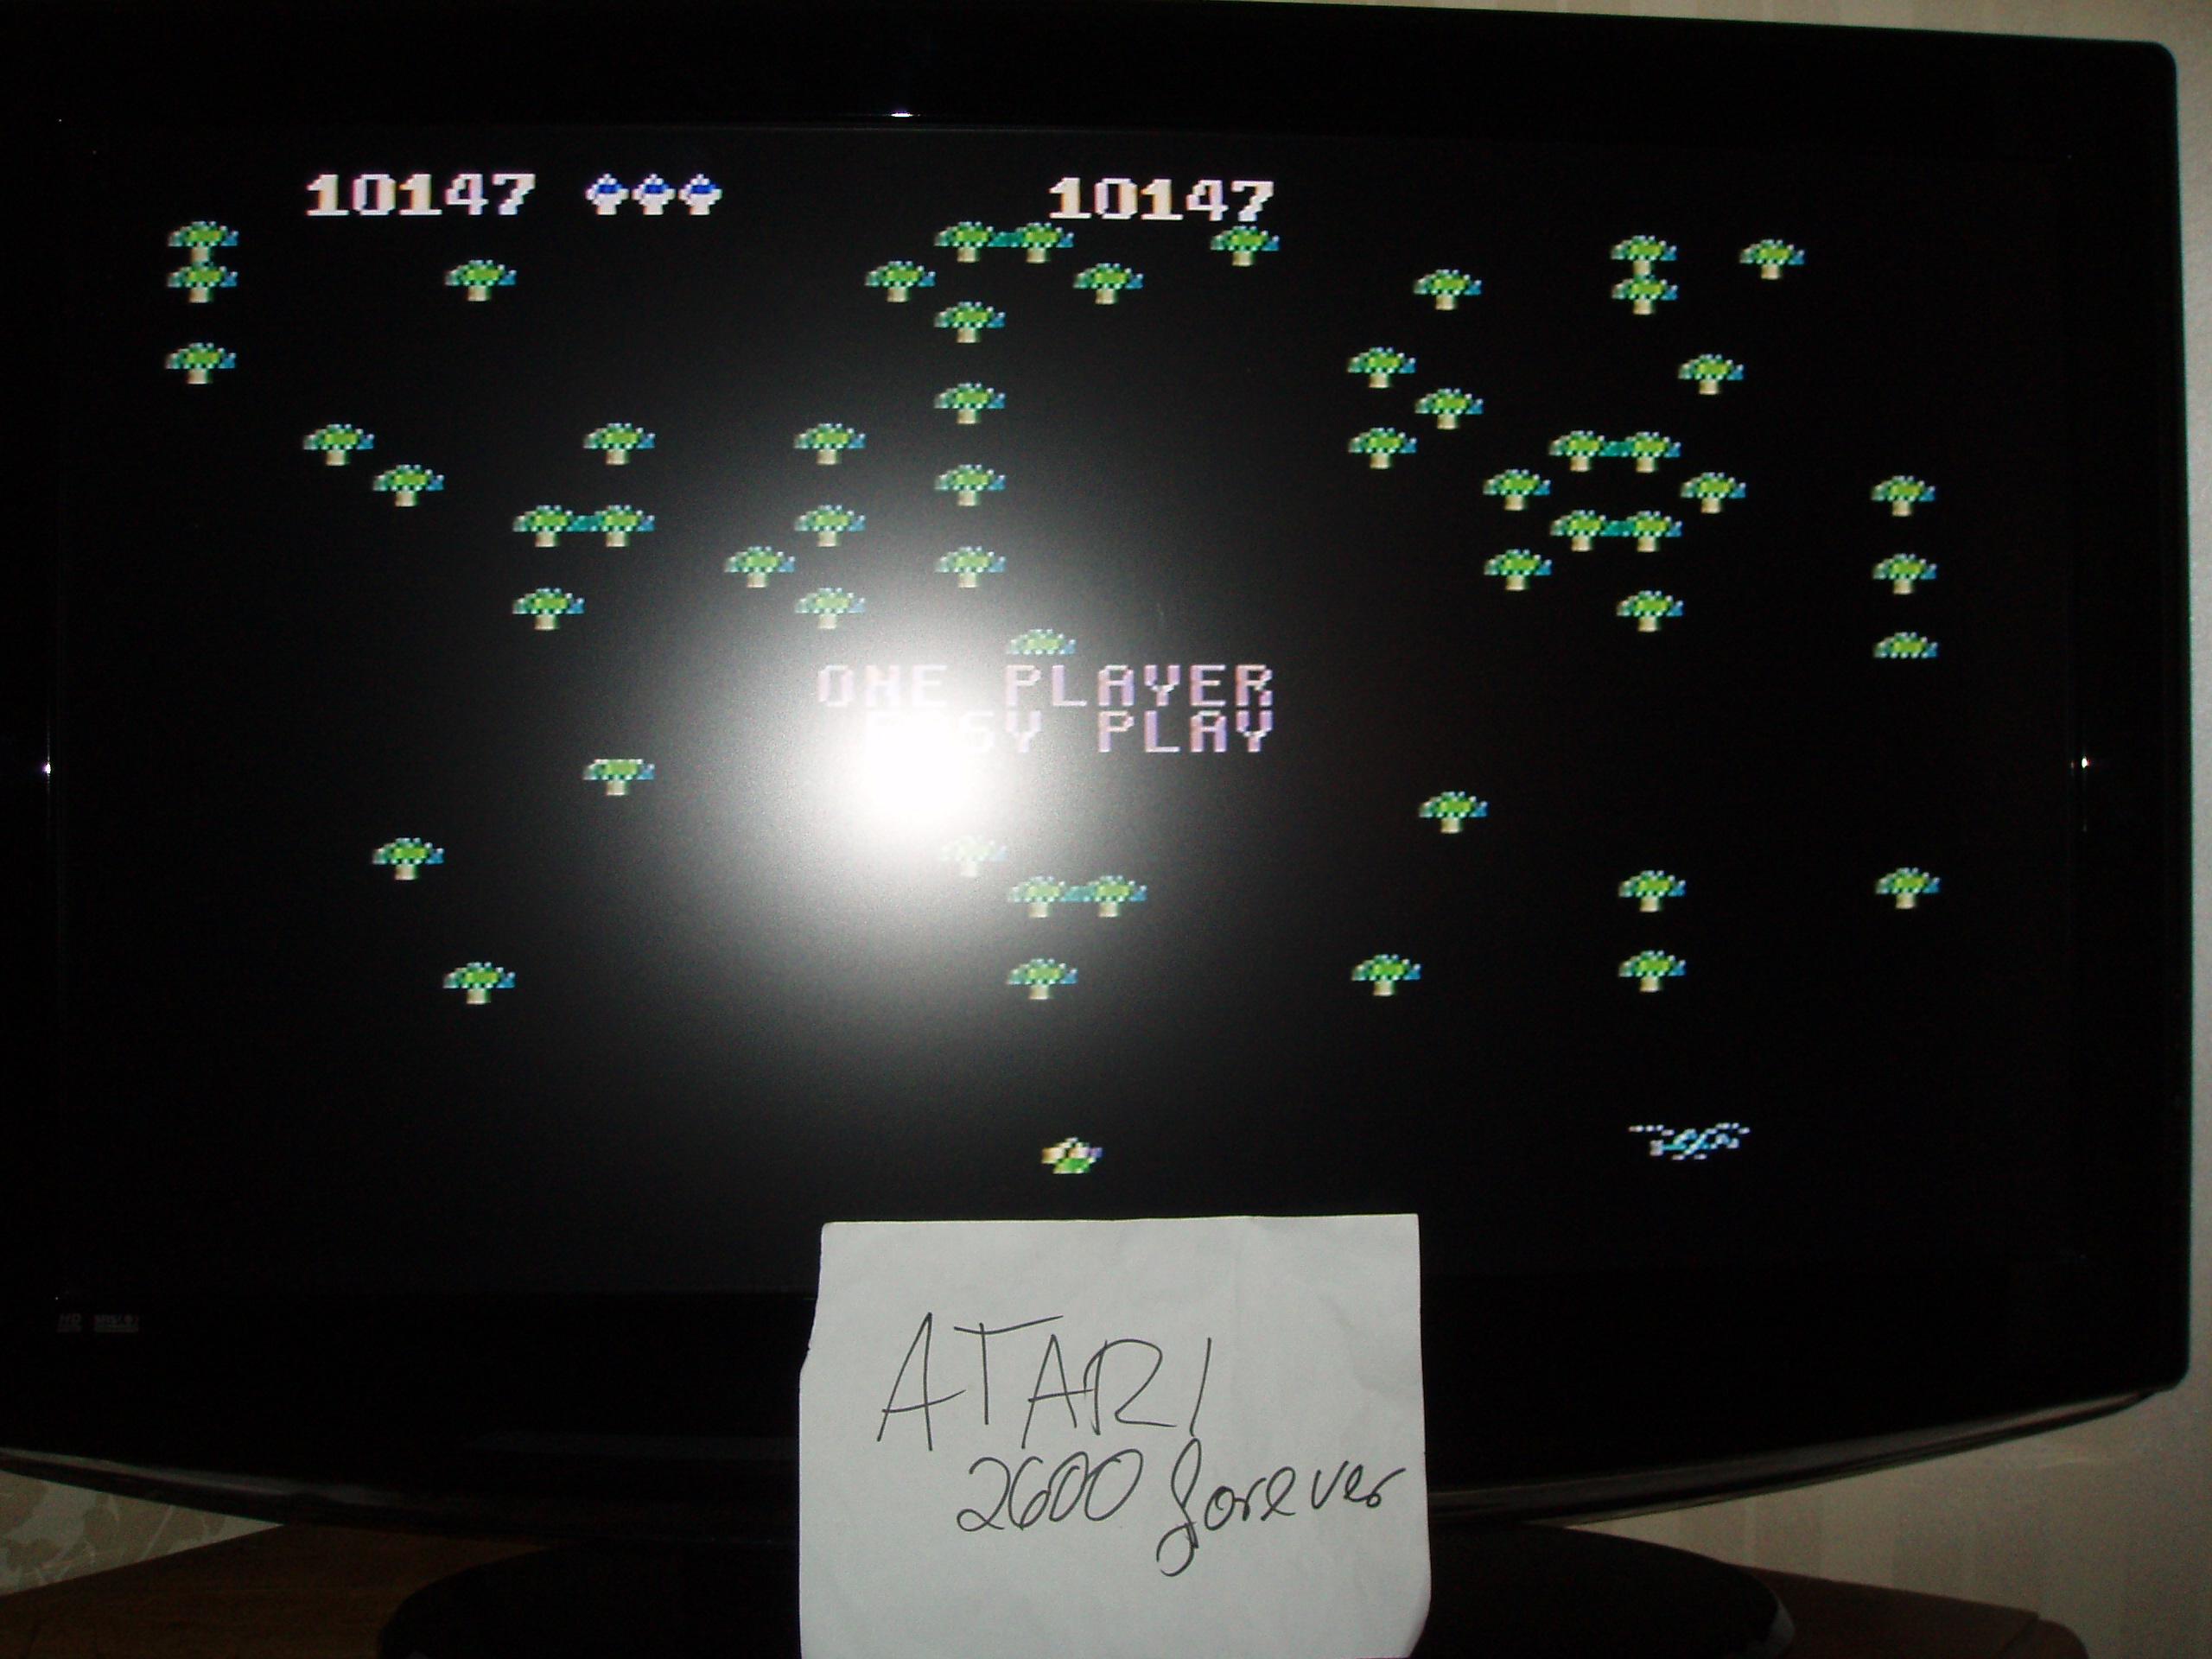 atari2600forever: Centipede: Easy (Atari 5200) 10,147 points on 2018-12-18 03:27:53